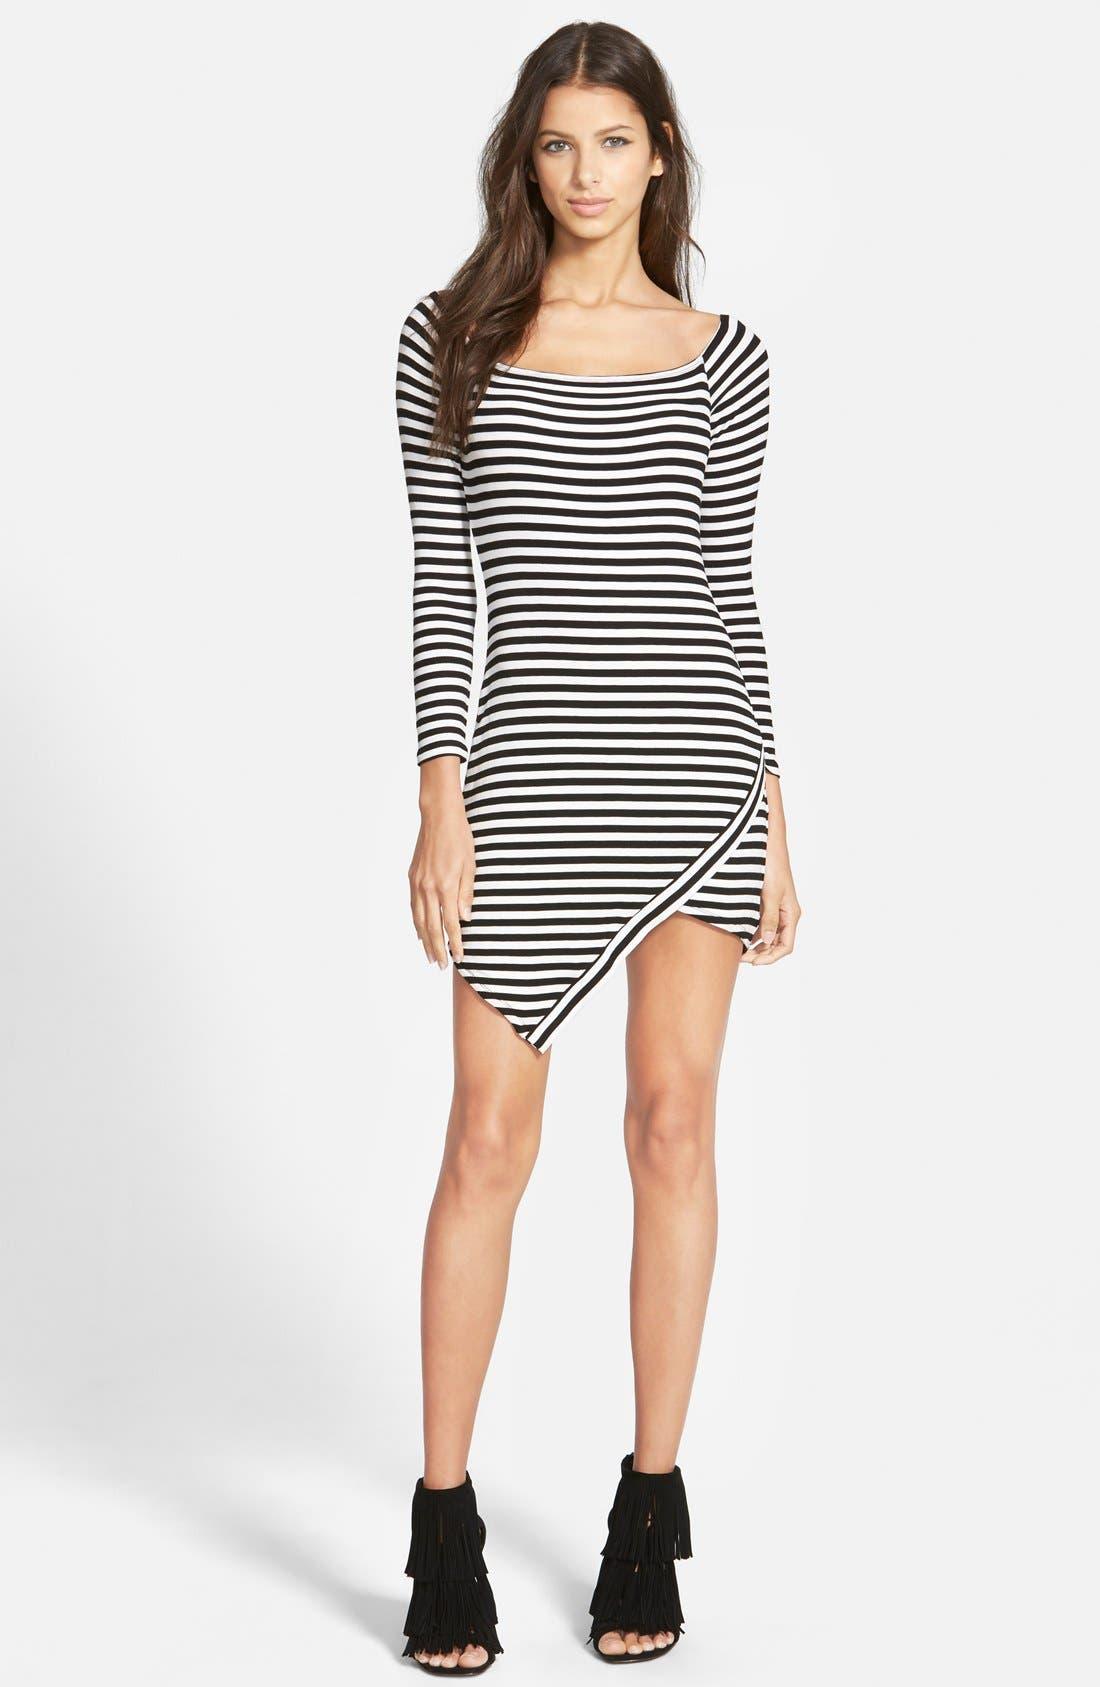 Alternate Image 1 Selected - Lovers + Friends 'Sweet' Stripe Body-Con Dress